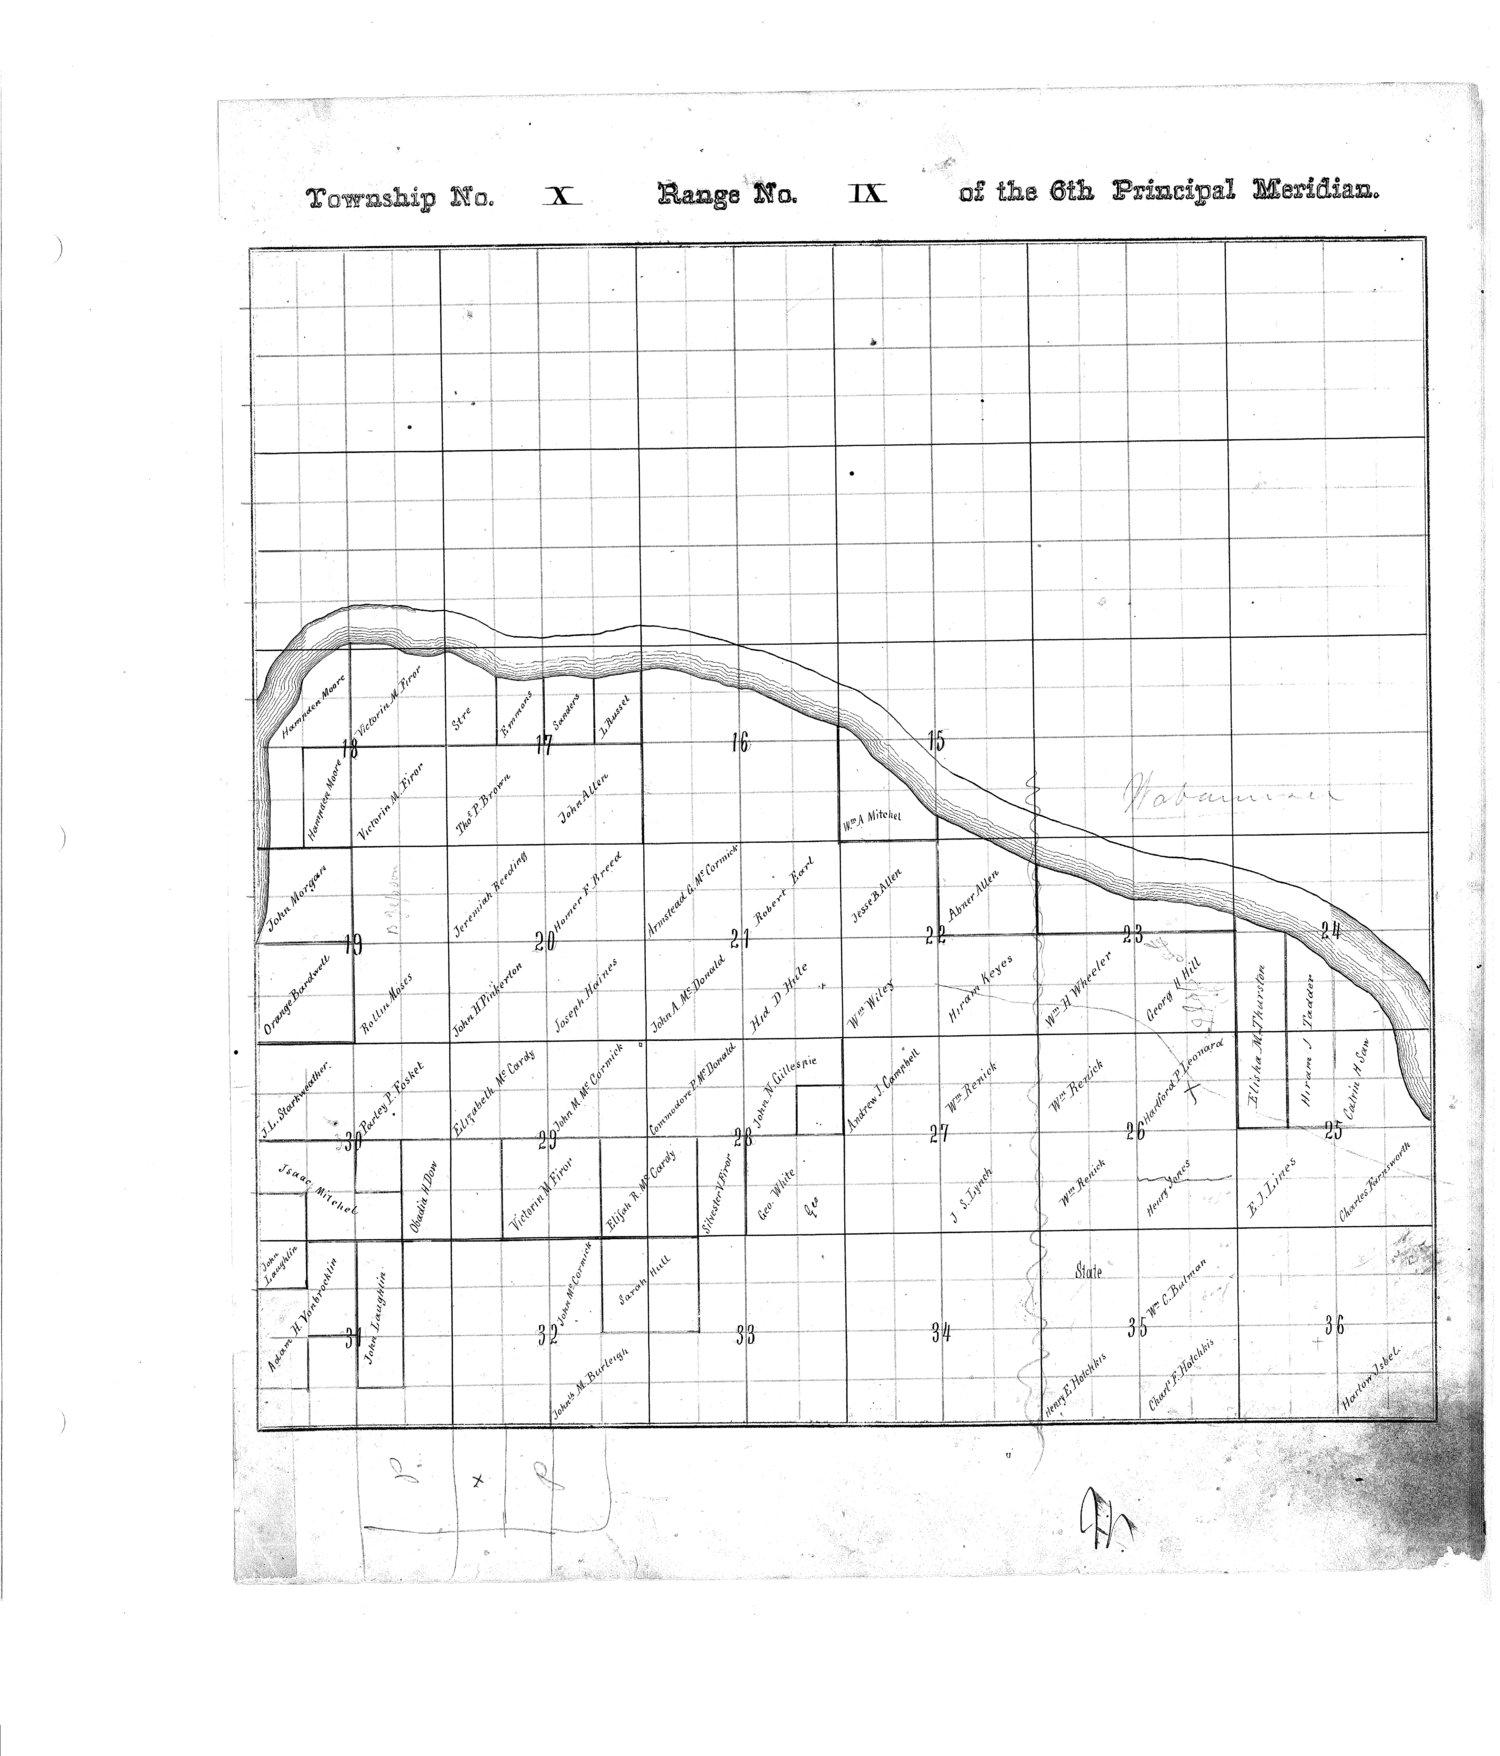 Richardson County and Wabaunsee County, Kansas, survey - 6